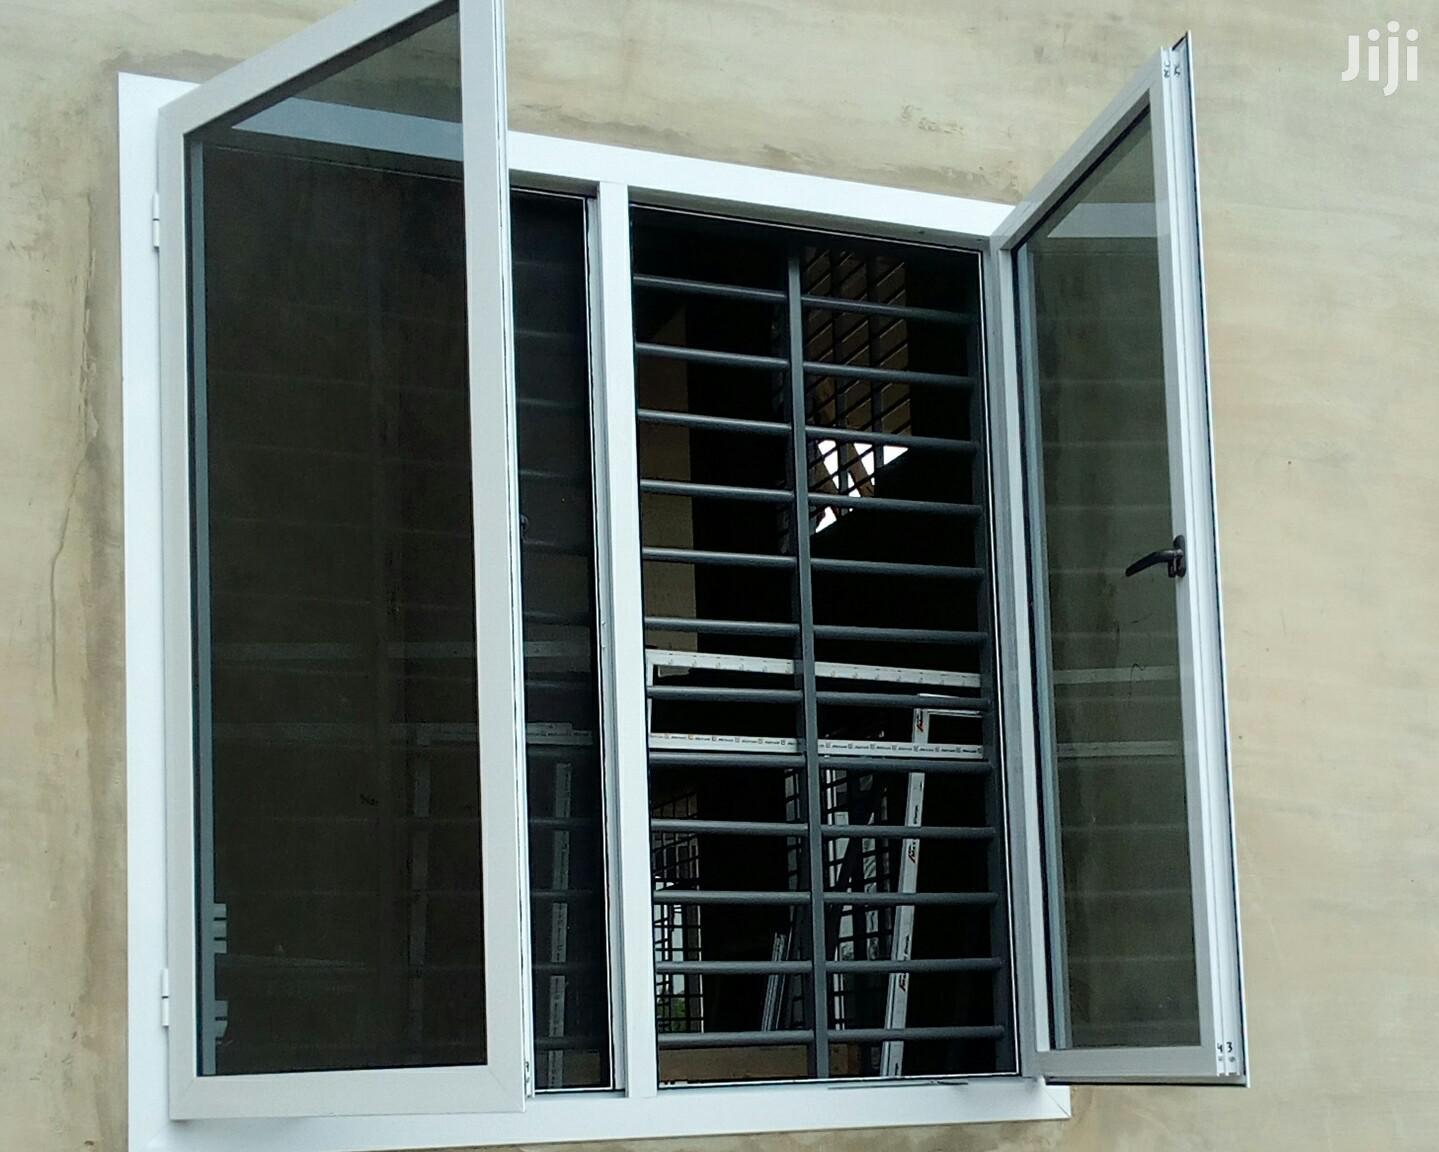 Windows Work | Windows for sale in Accra Metropolitan, Greater Accra, Ghana